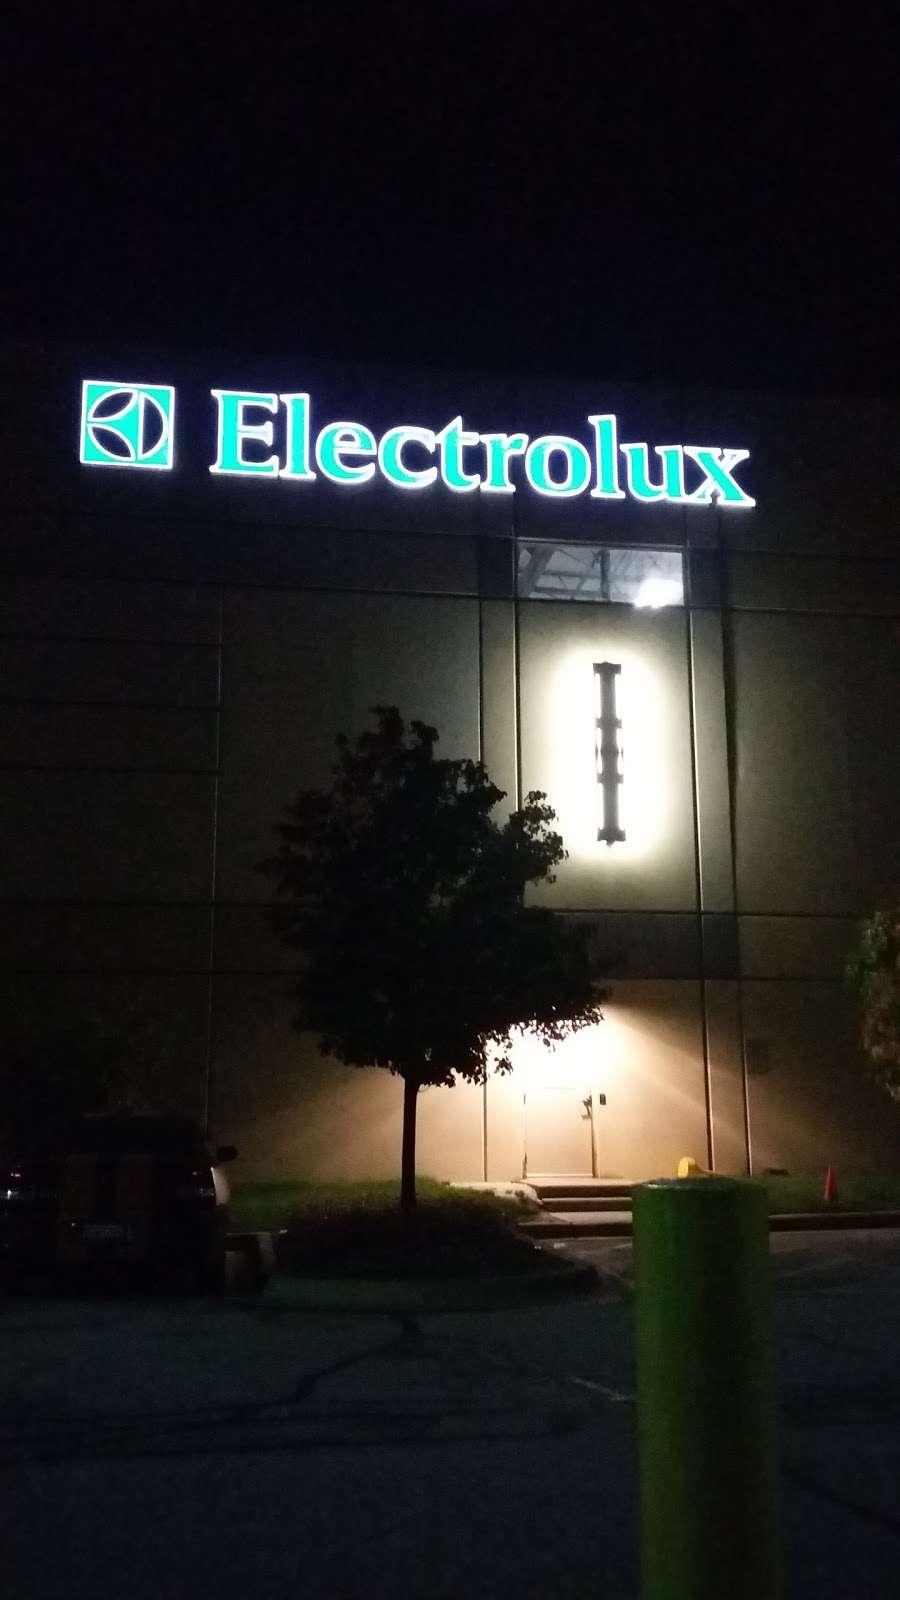 Electrolux - storage  | Photo 7 of 8 | Address: 801 Mid Point Rd, Minooka, IL 60447, USA | Phone: (815) 521-2200